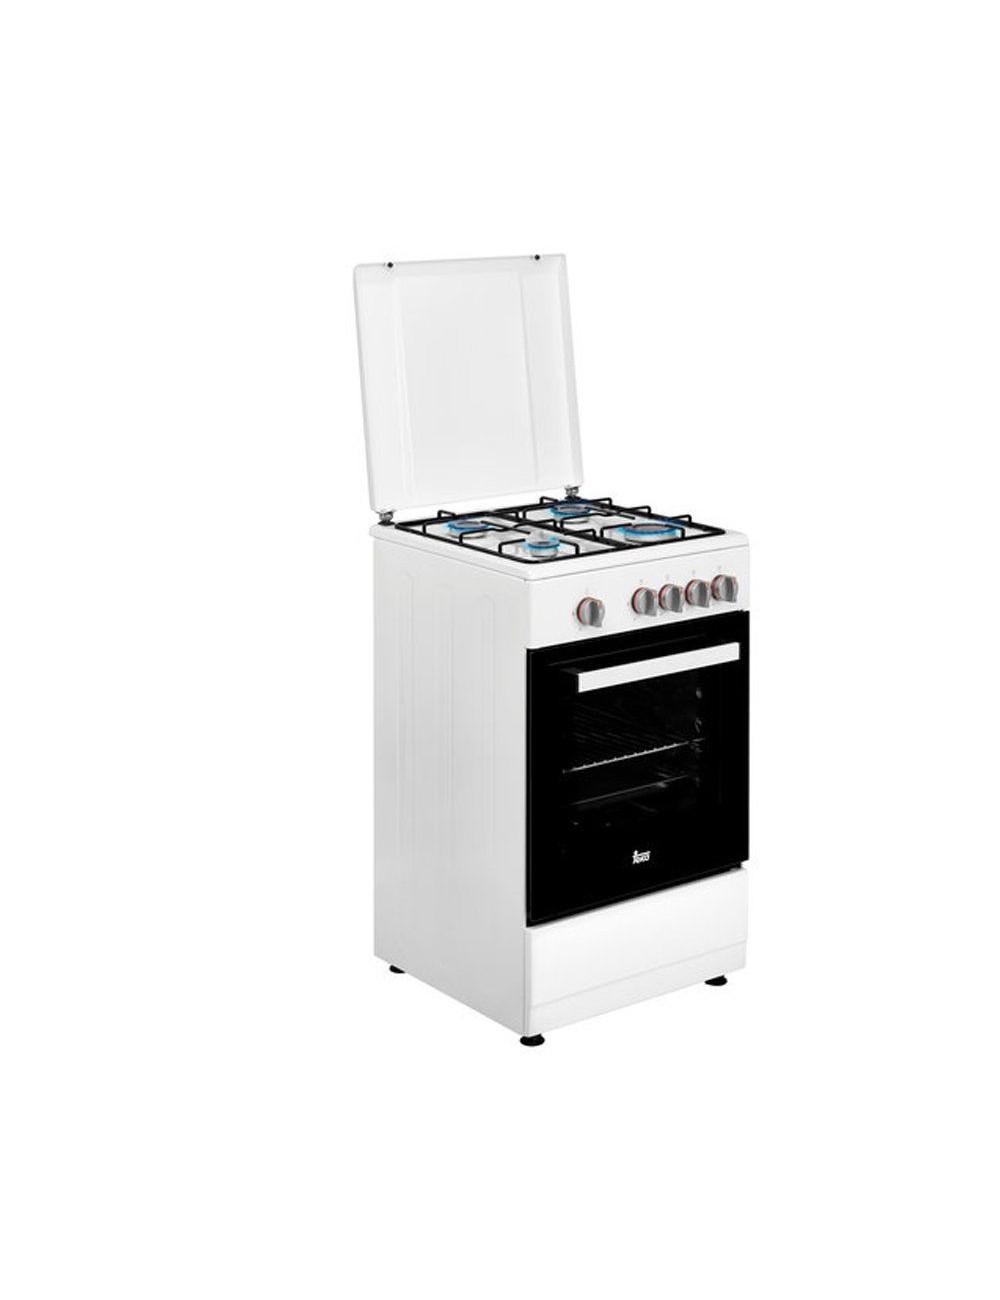 COCINA FS 502 4GG WH LPG